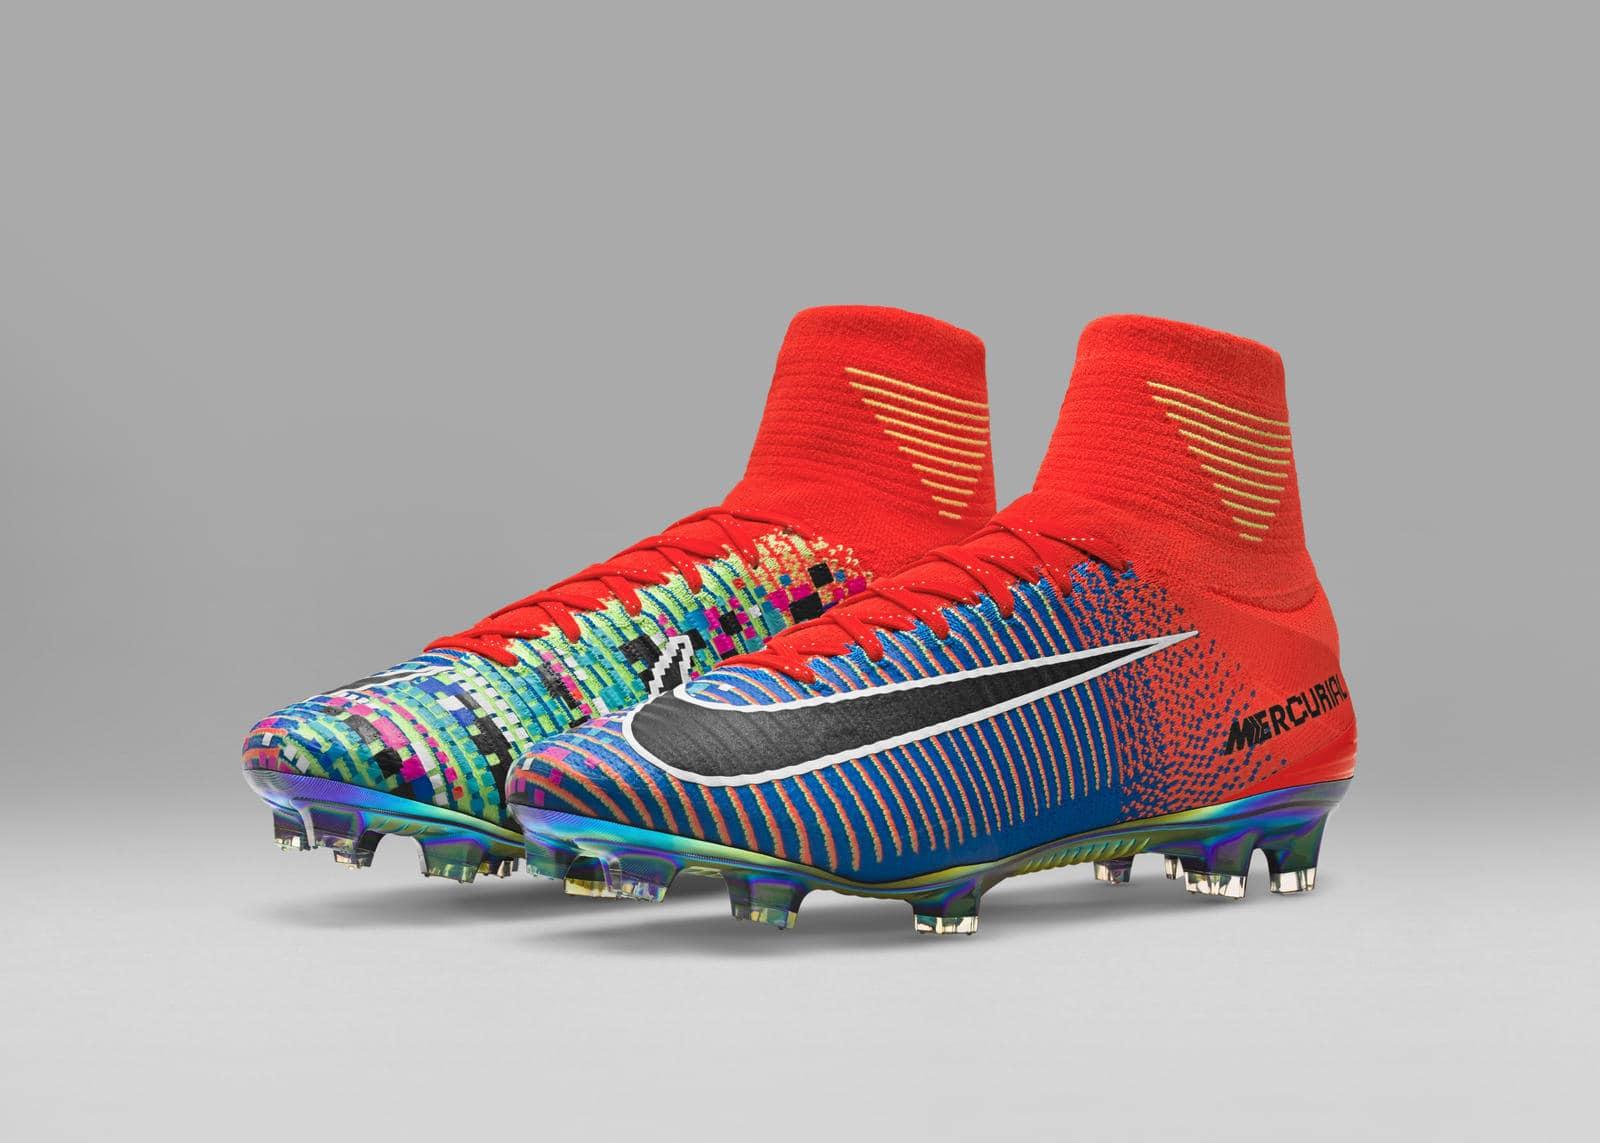 Nike Mercurial X EA Sports: Fußballschuh für FIFA-Fans